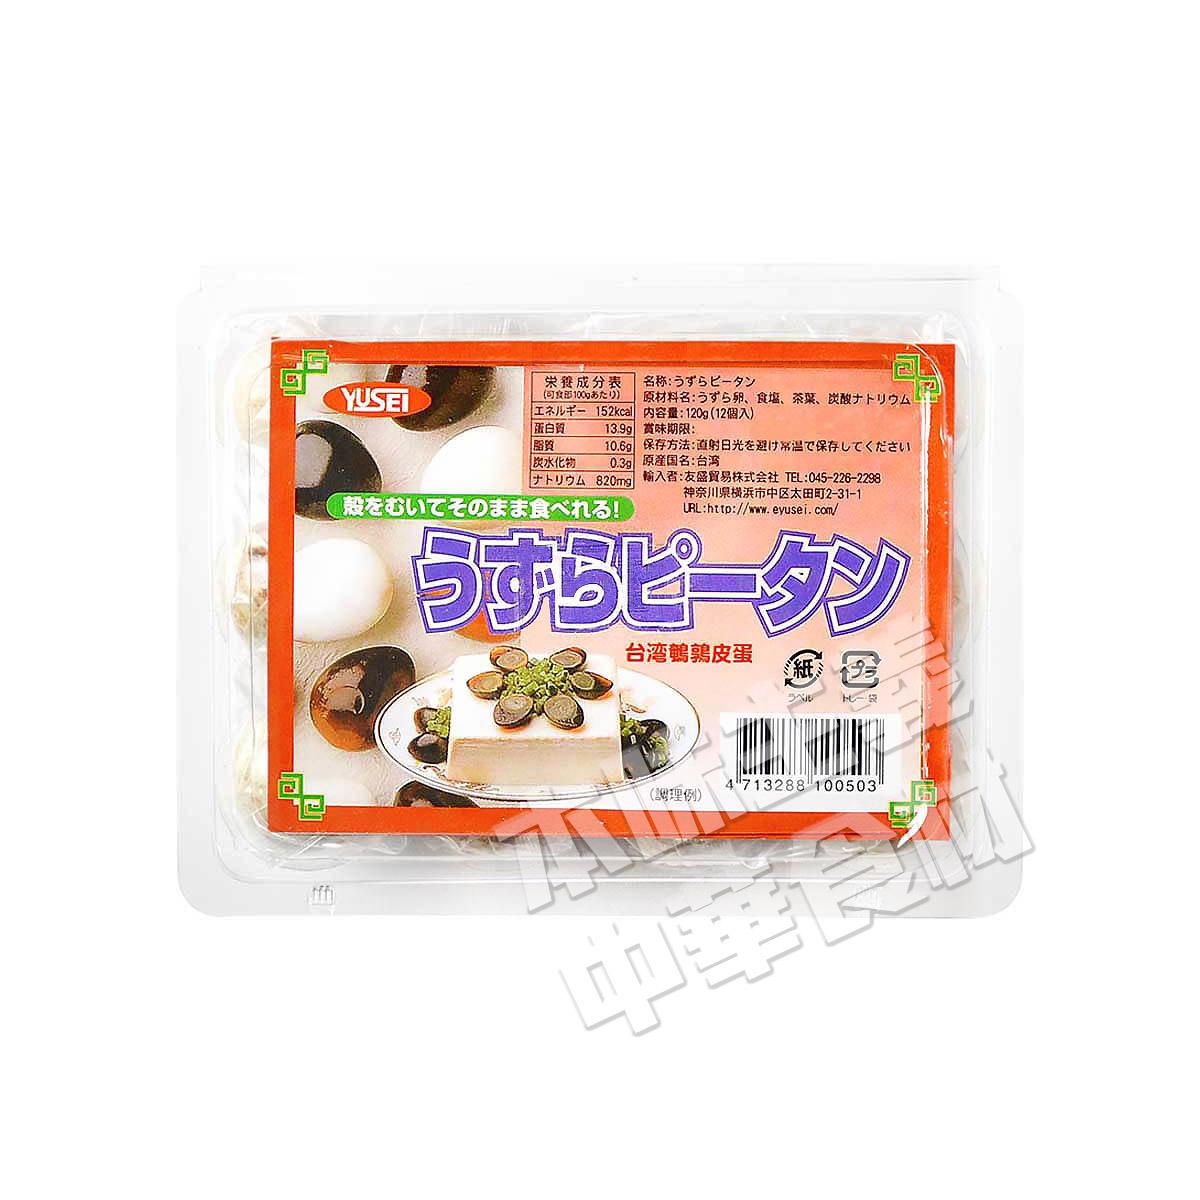 友盛台湾鵪鶉皮蛋(うずらピータン) 中華食材調味料・中華料理人気商品・台湾風味名物